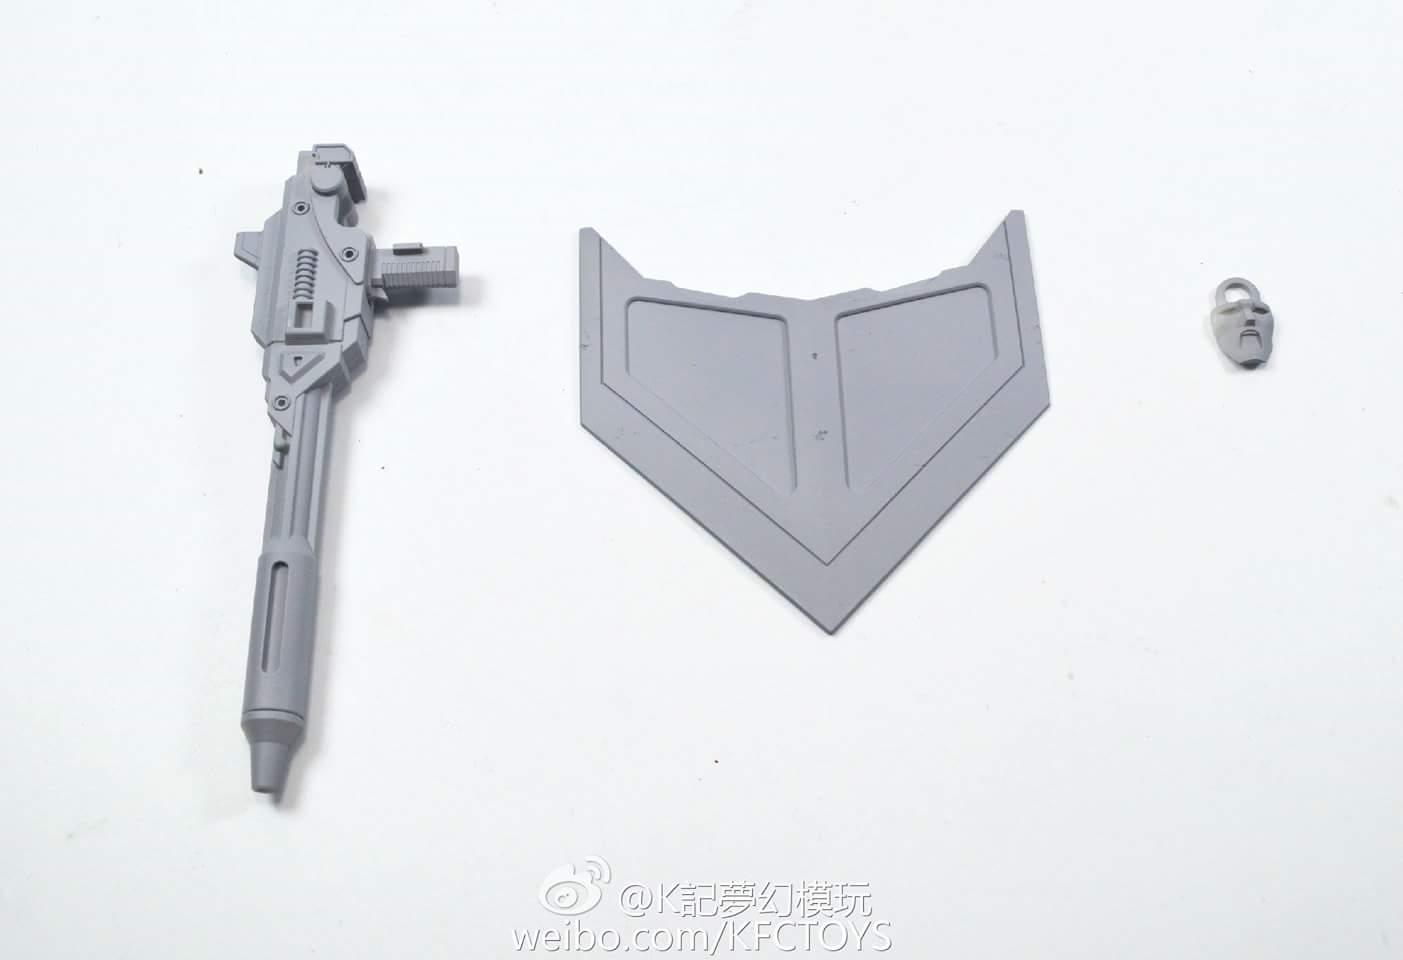 [KFC Toys] Produit Tiers - Jouet E.A.V.I Metal Phase 11A Stratotanker - aka Octane ZMUfG8NU